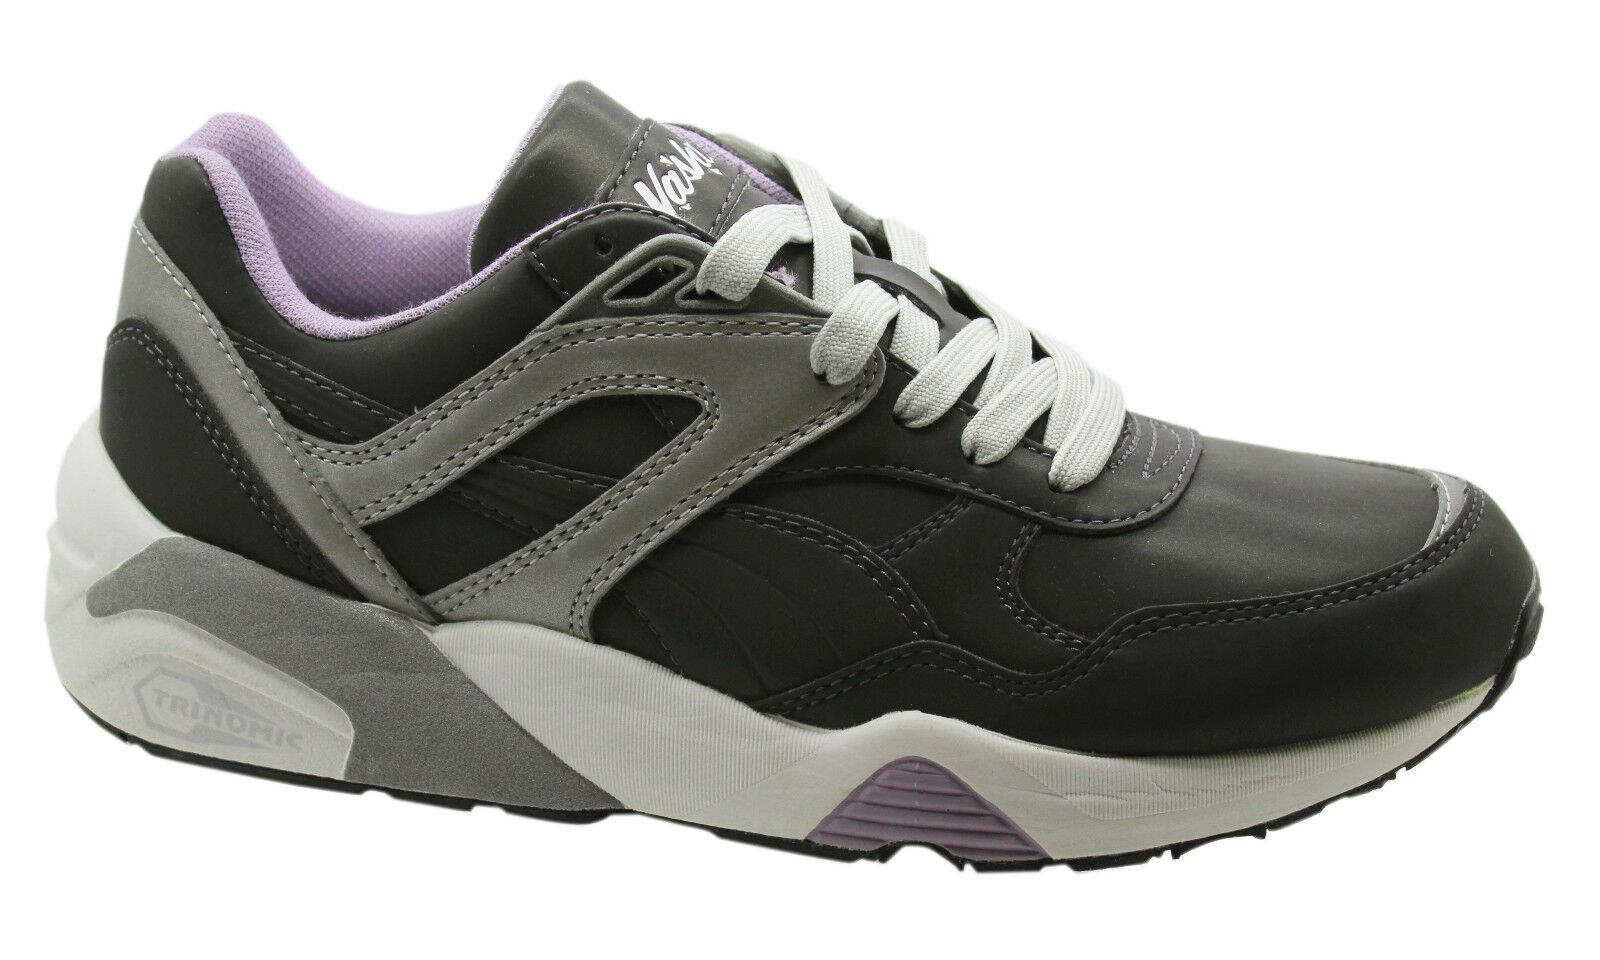 Puma Trinomic 3M R698 x Vashtie 90S 3M Trinomic Womens Trainers Lace Up Shoes 358484 01 U7 19abd0